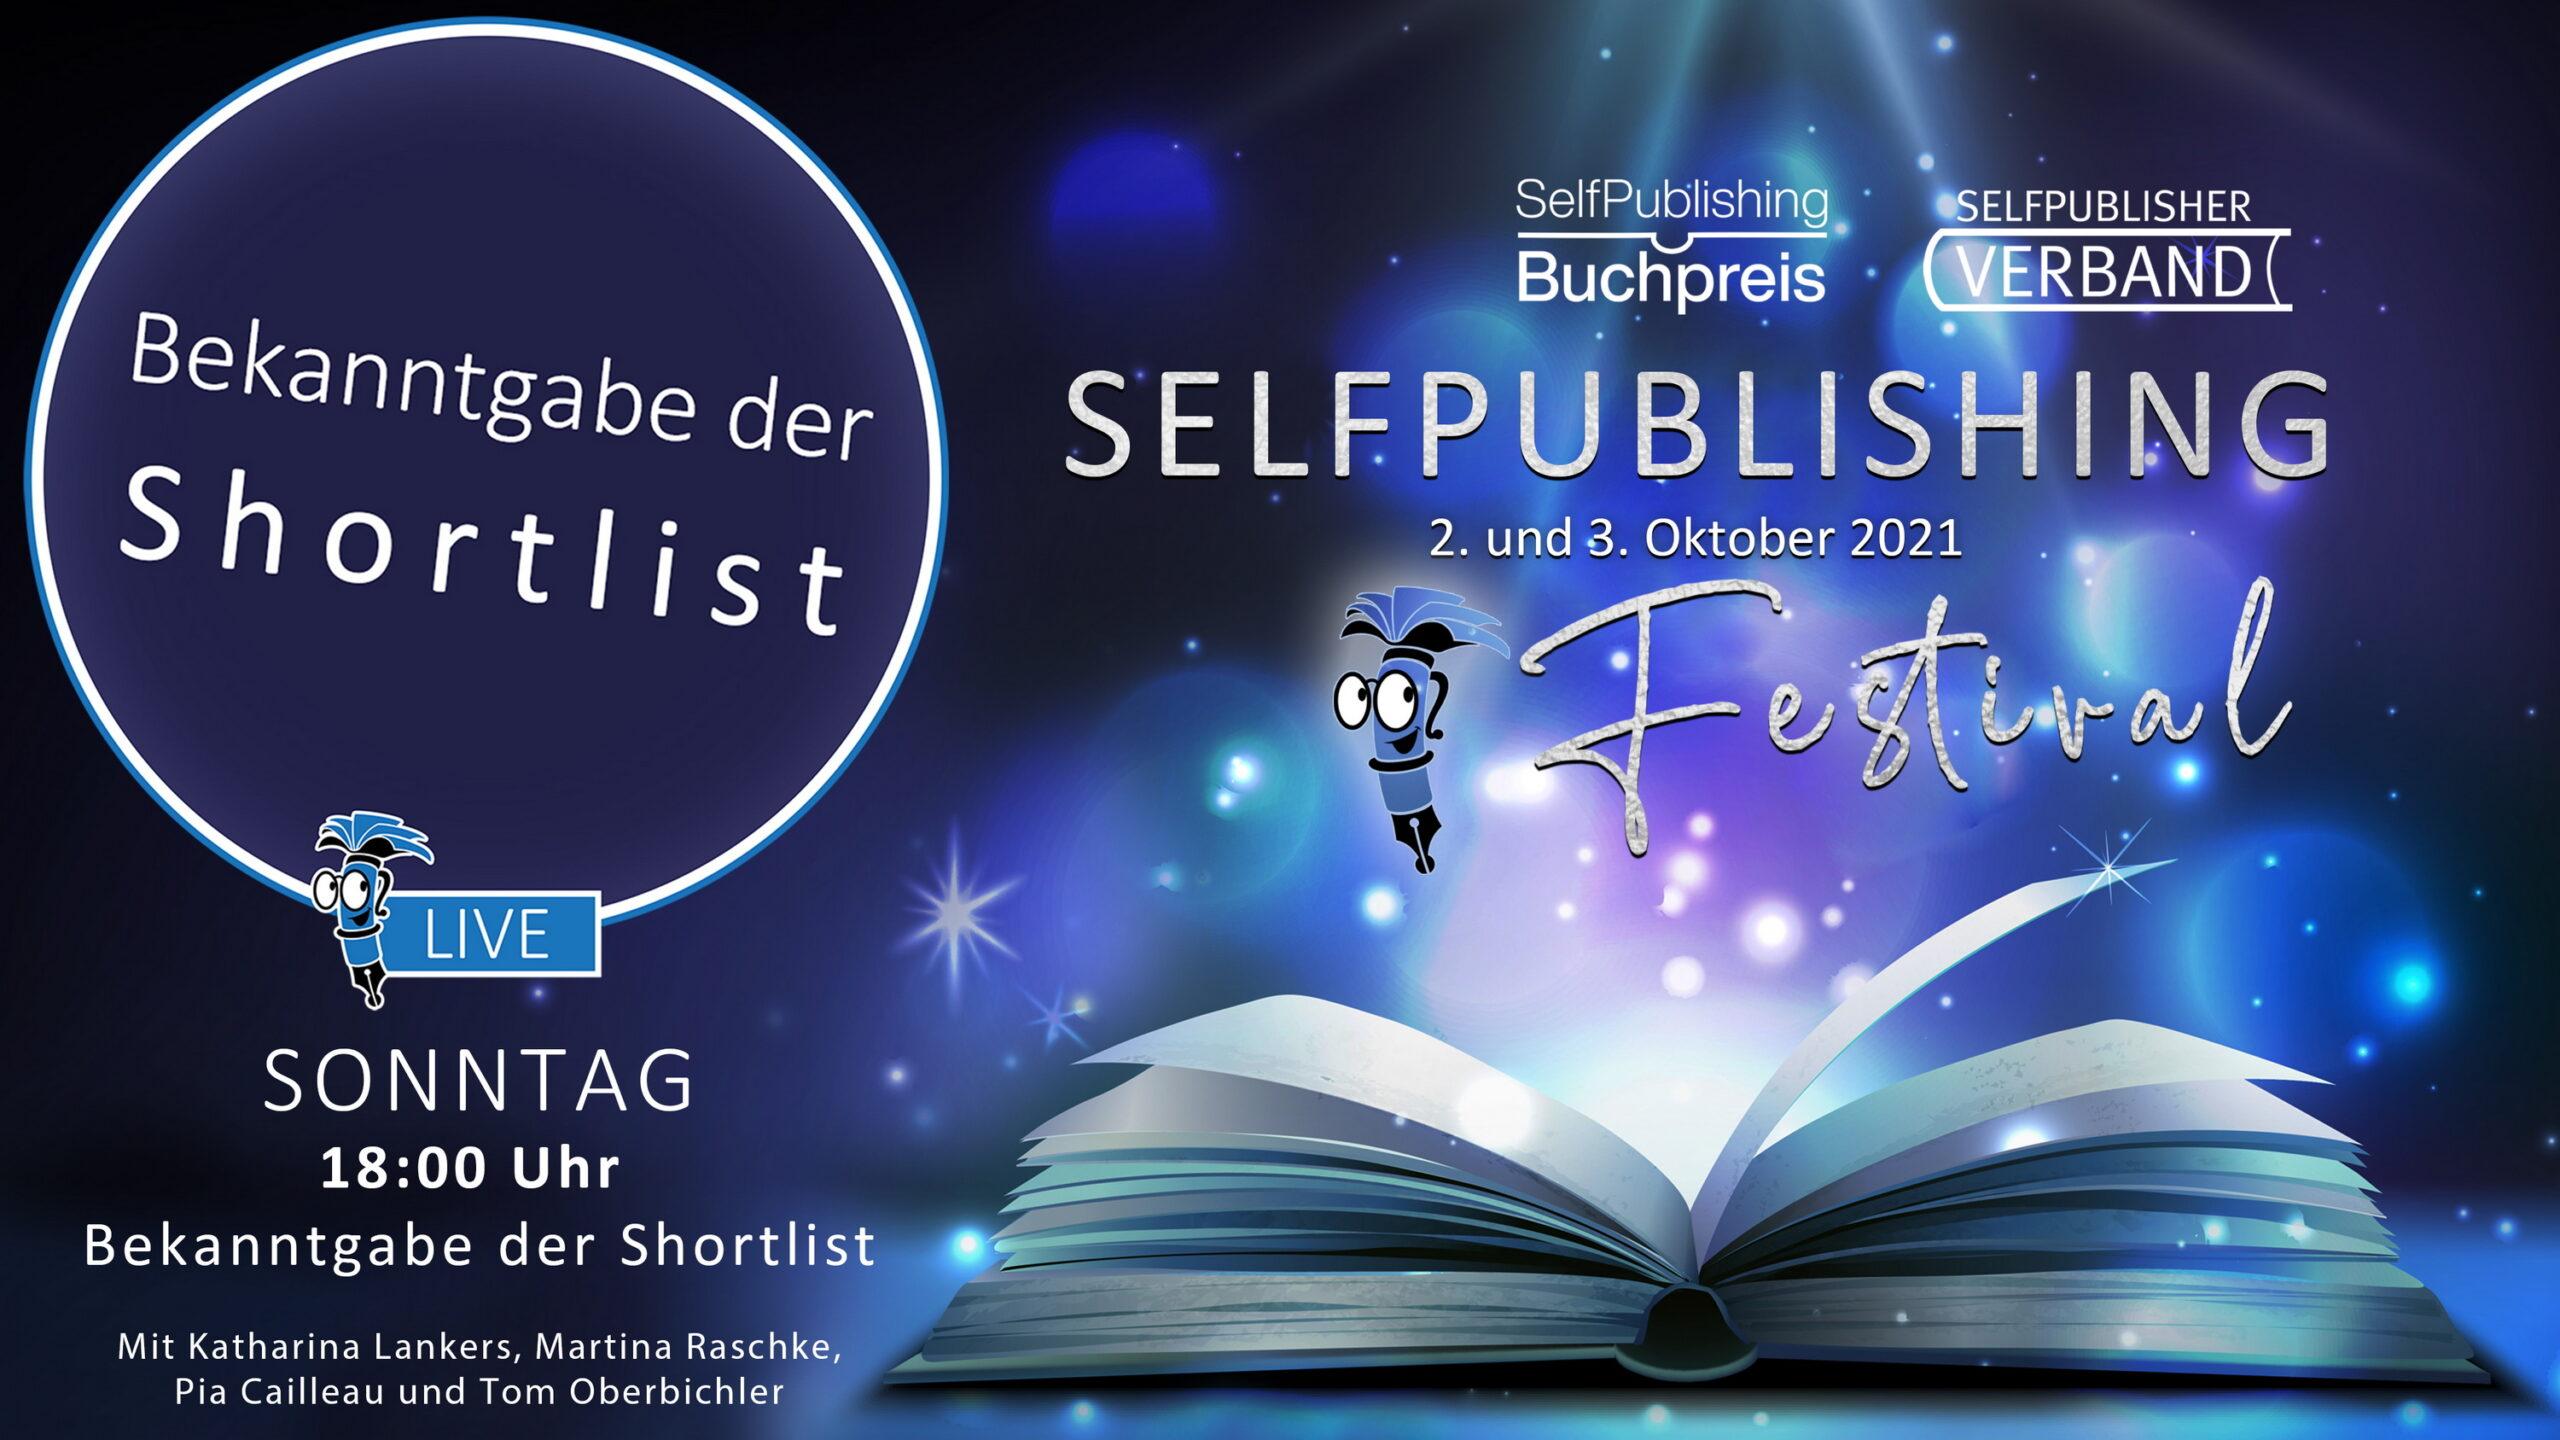 You are currently viewing Das ist die Shortlist des Selfpublishing-Buchpreises 2021